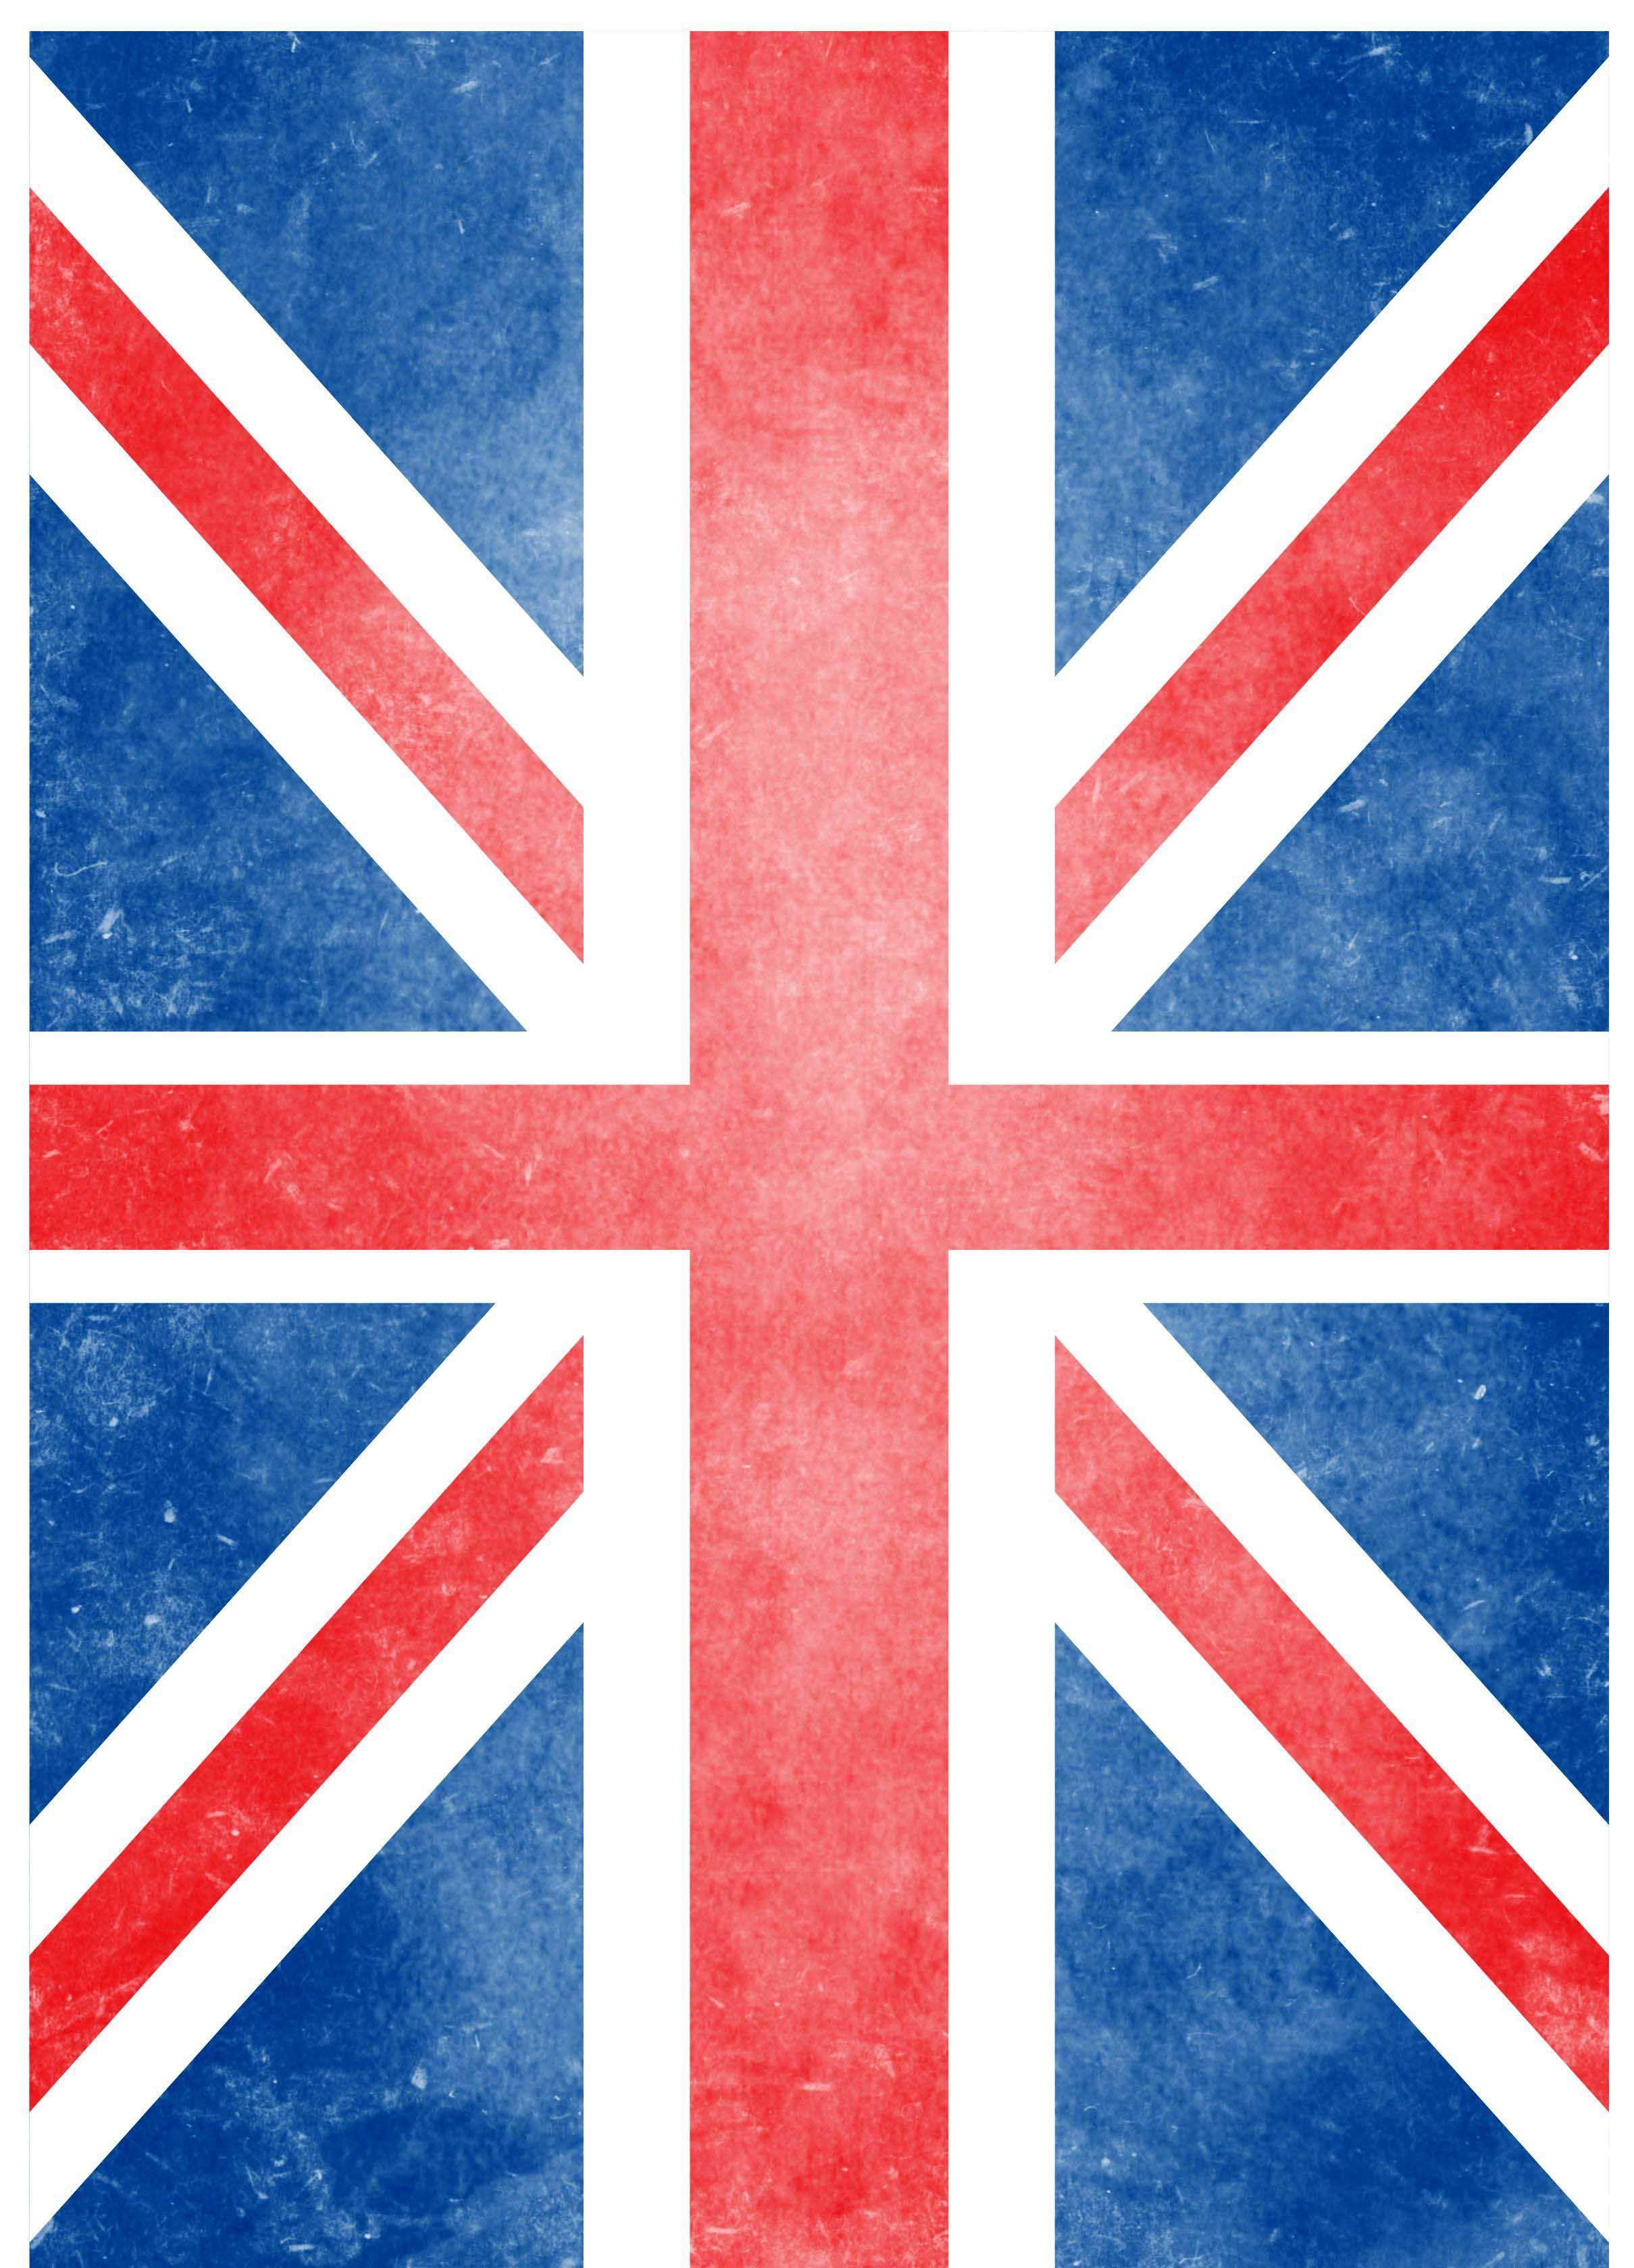 BANDERA DE INGLATERRA | londres | Pinterest | Bandera de inglaterra ...